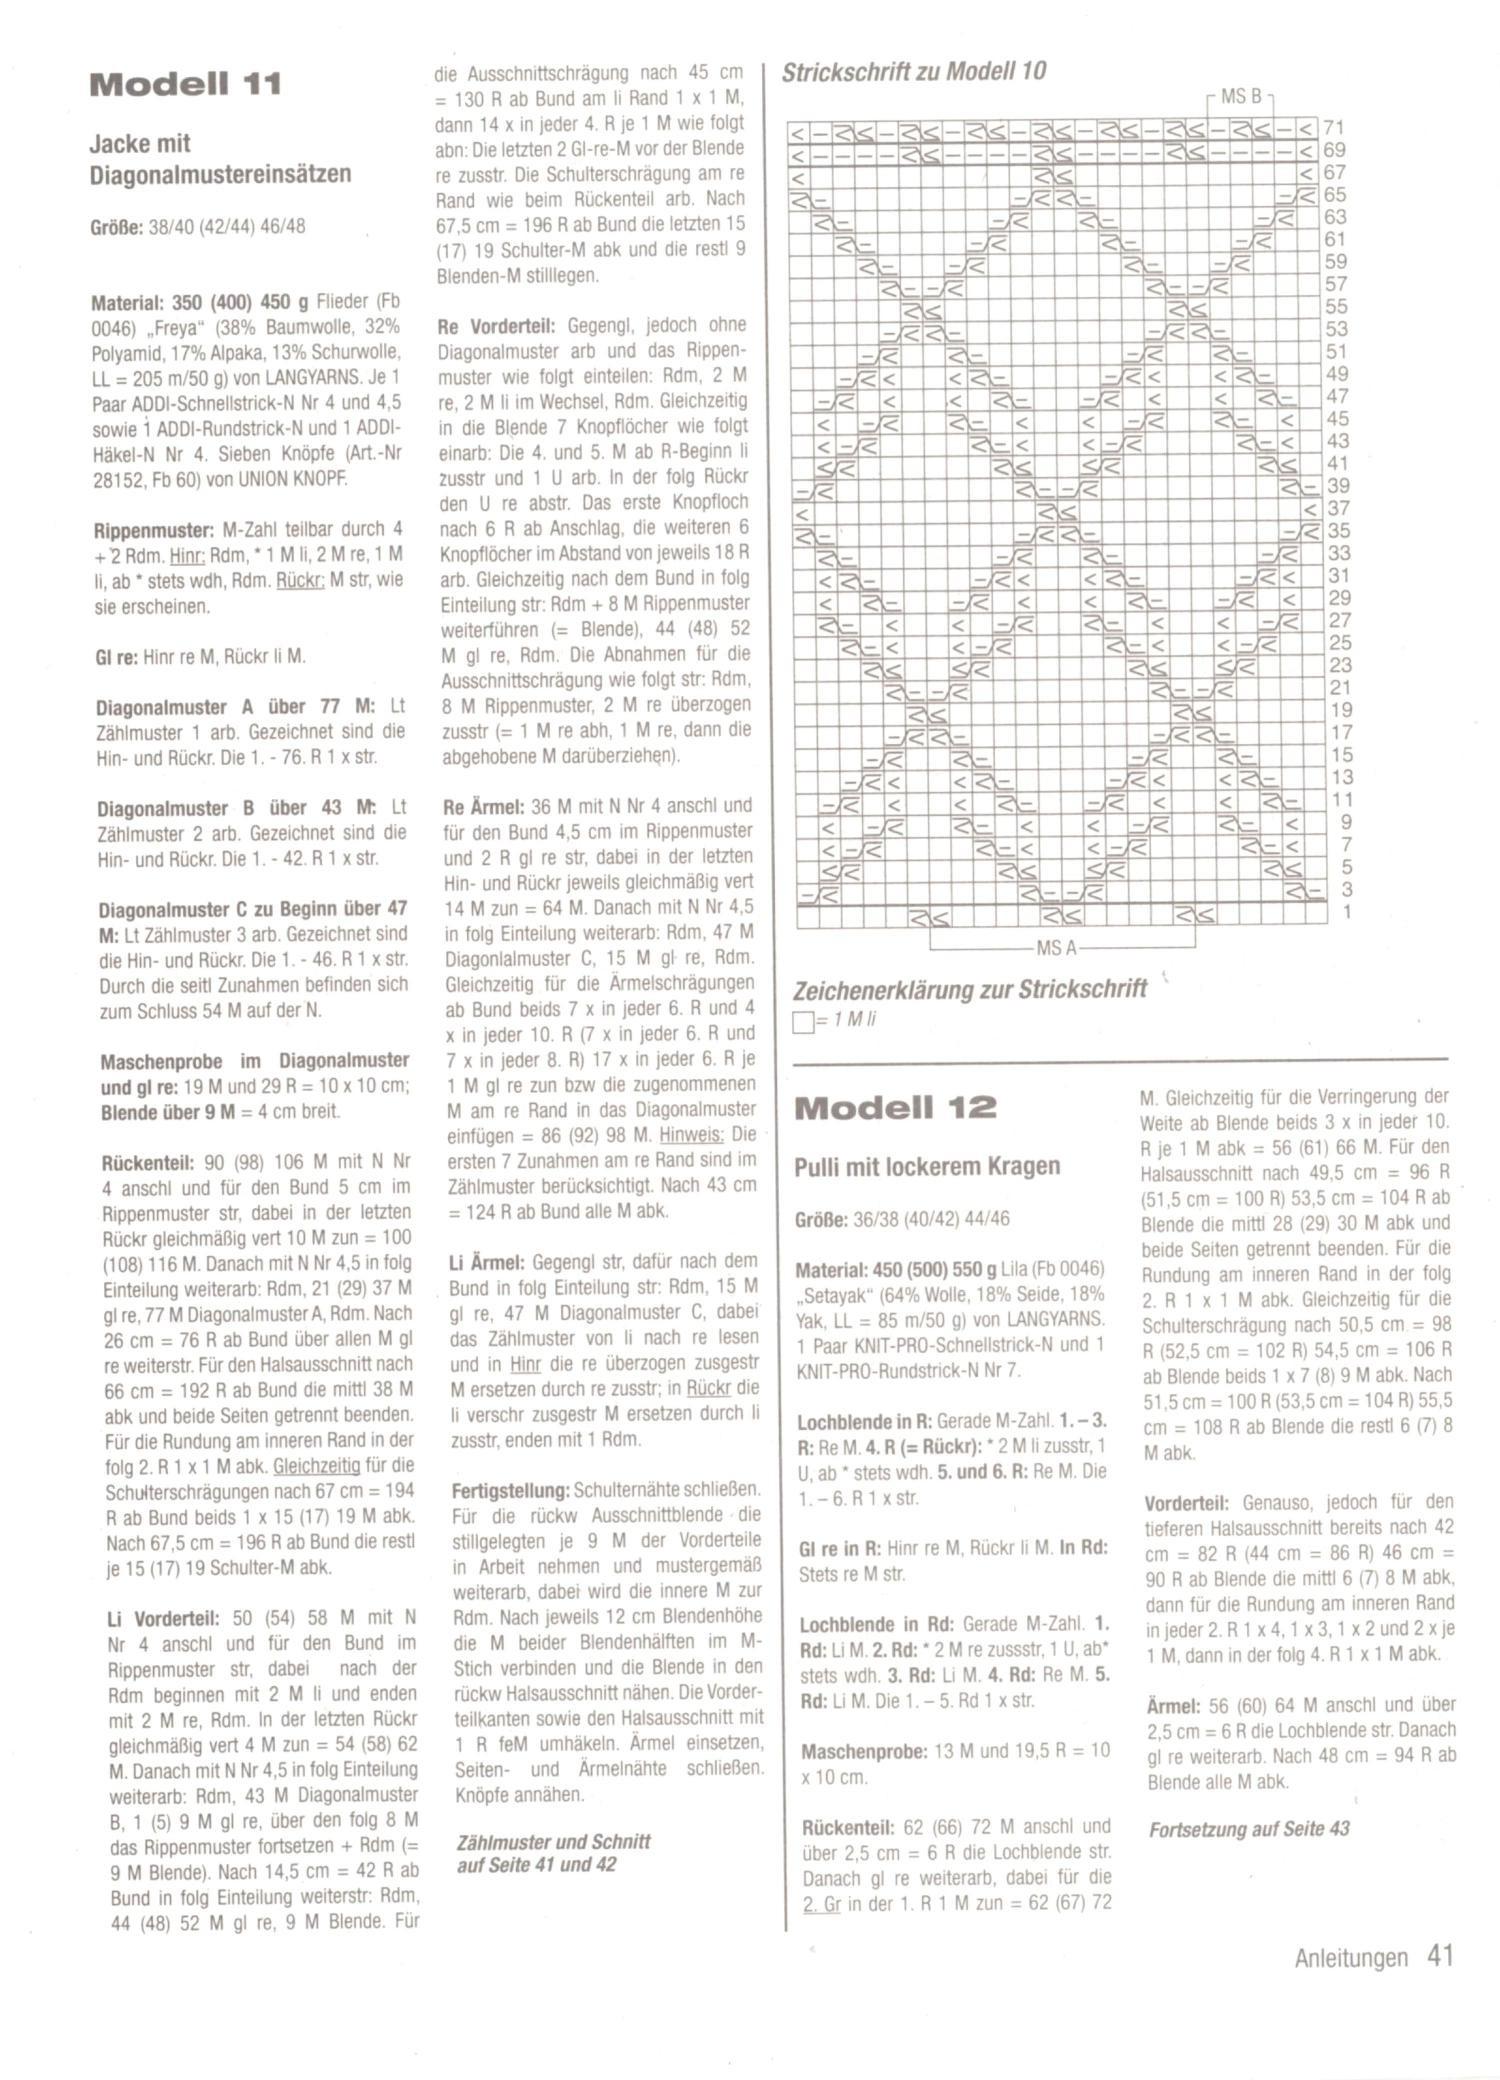 Page_00041.jpg